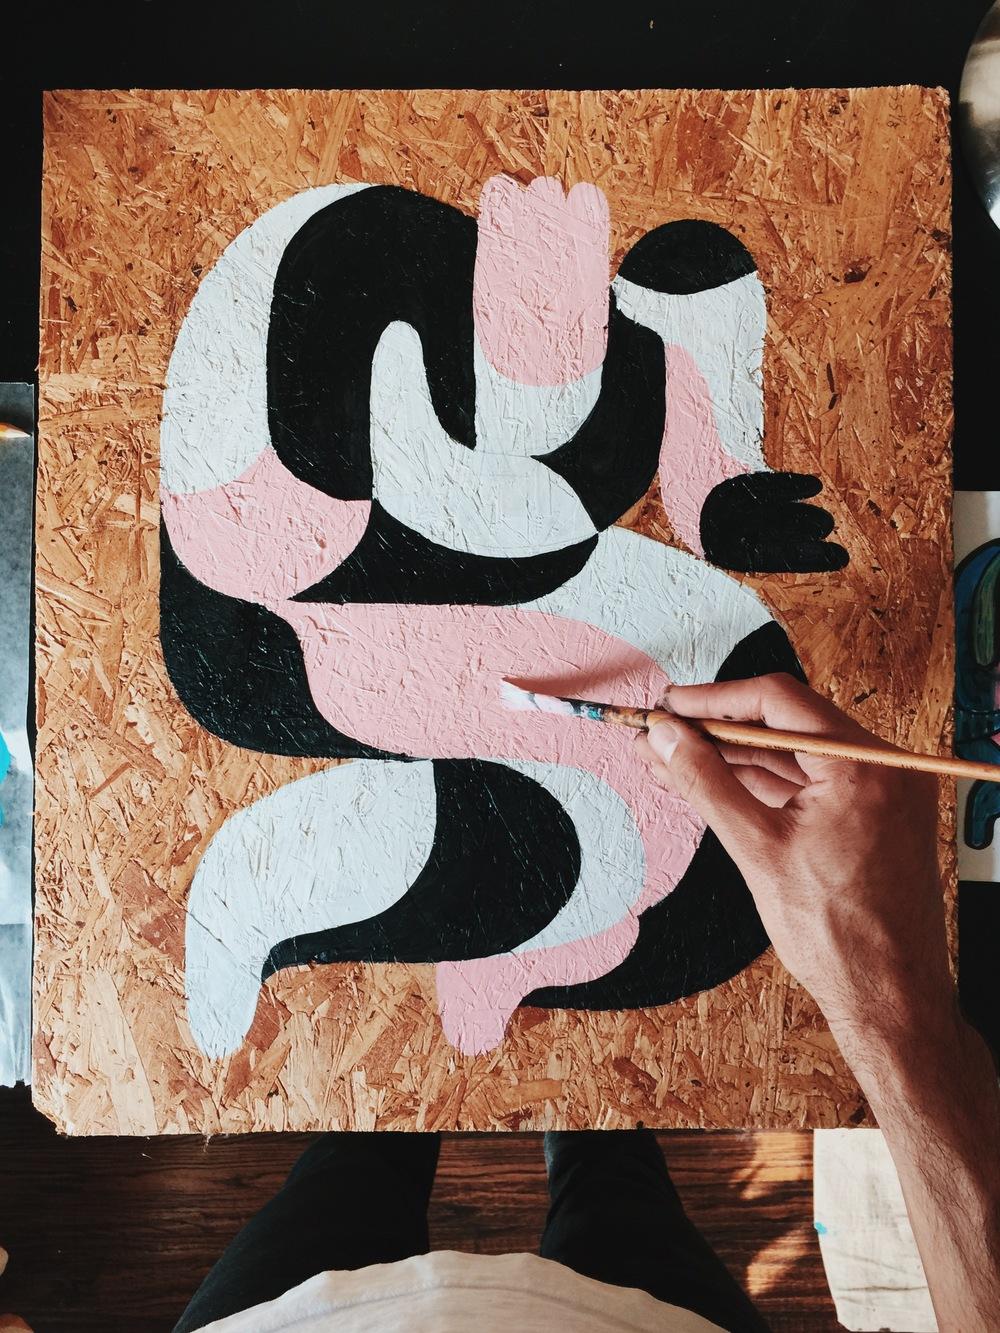 Original Painting on wood by Kyle Steed